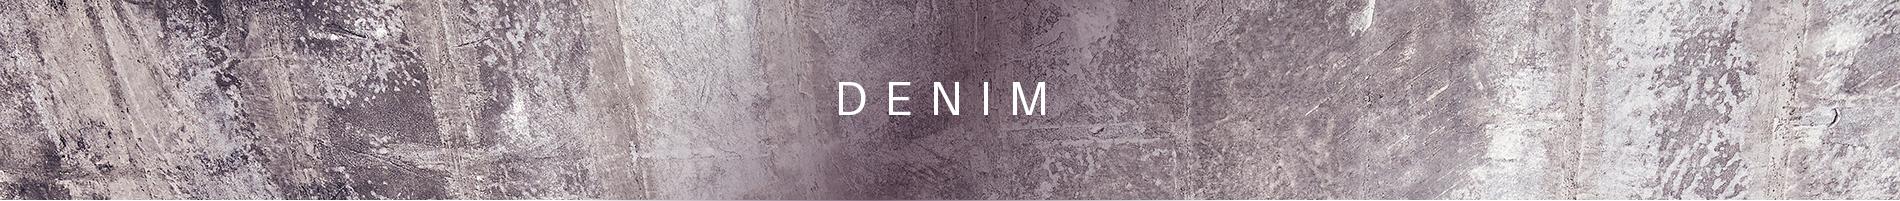 DENIM | SECOND SKIN